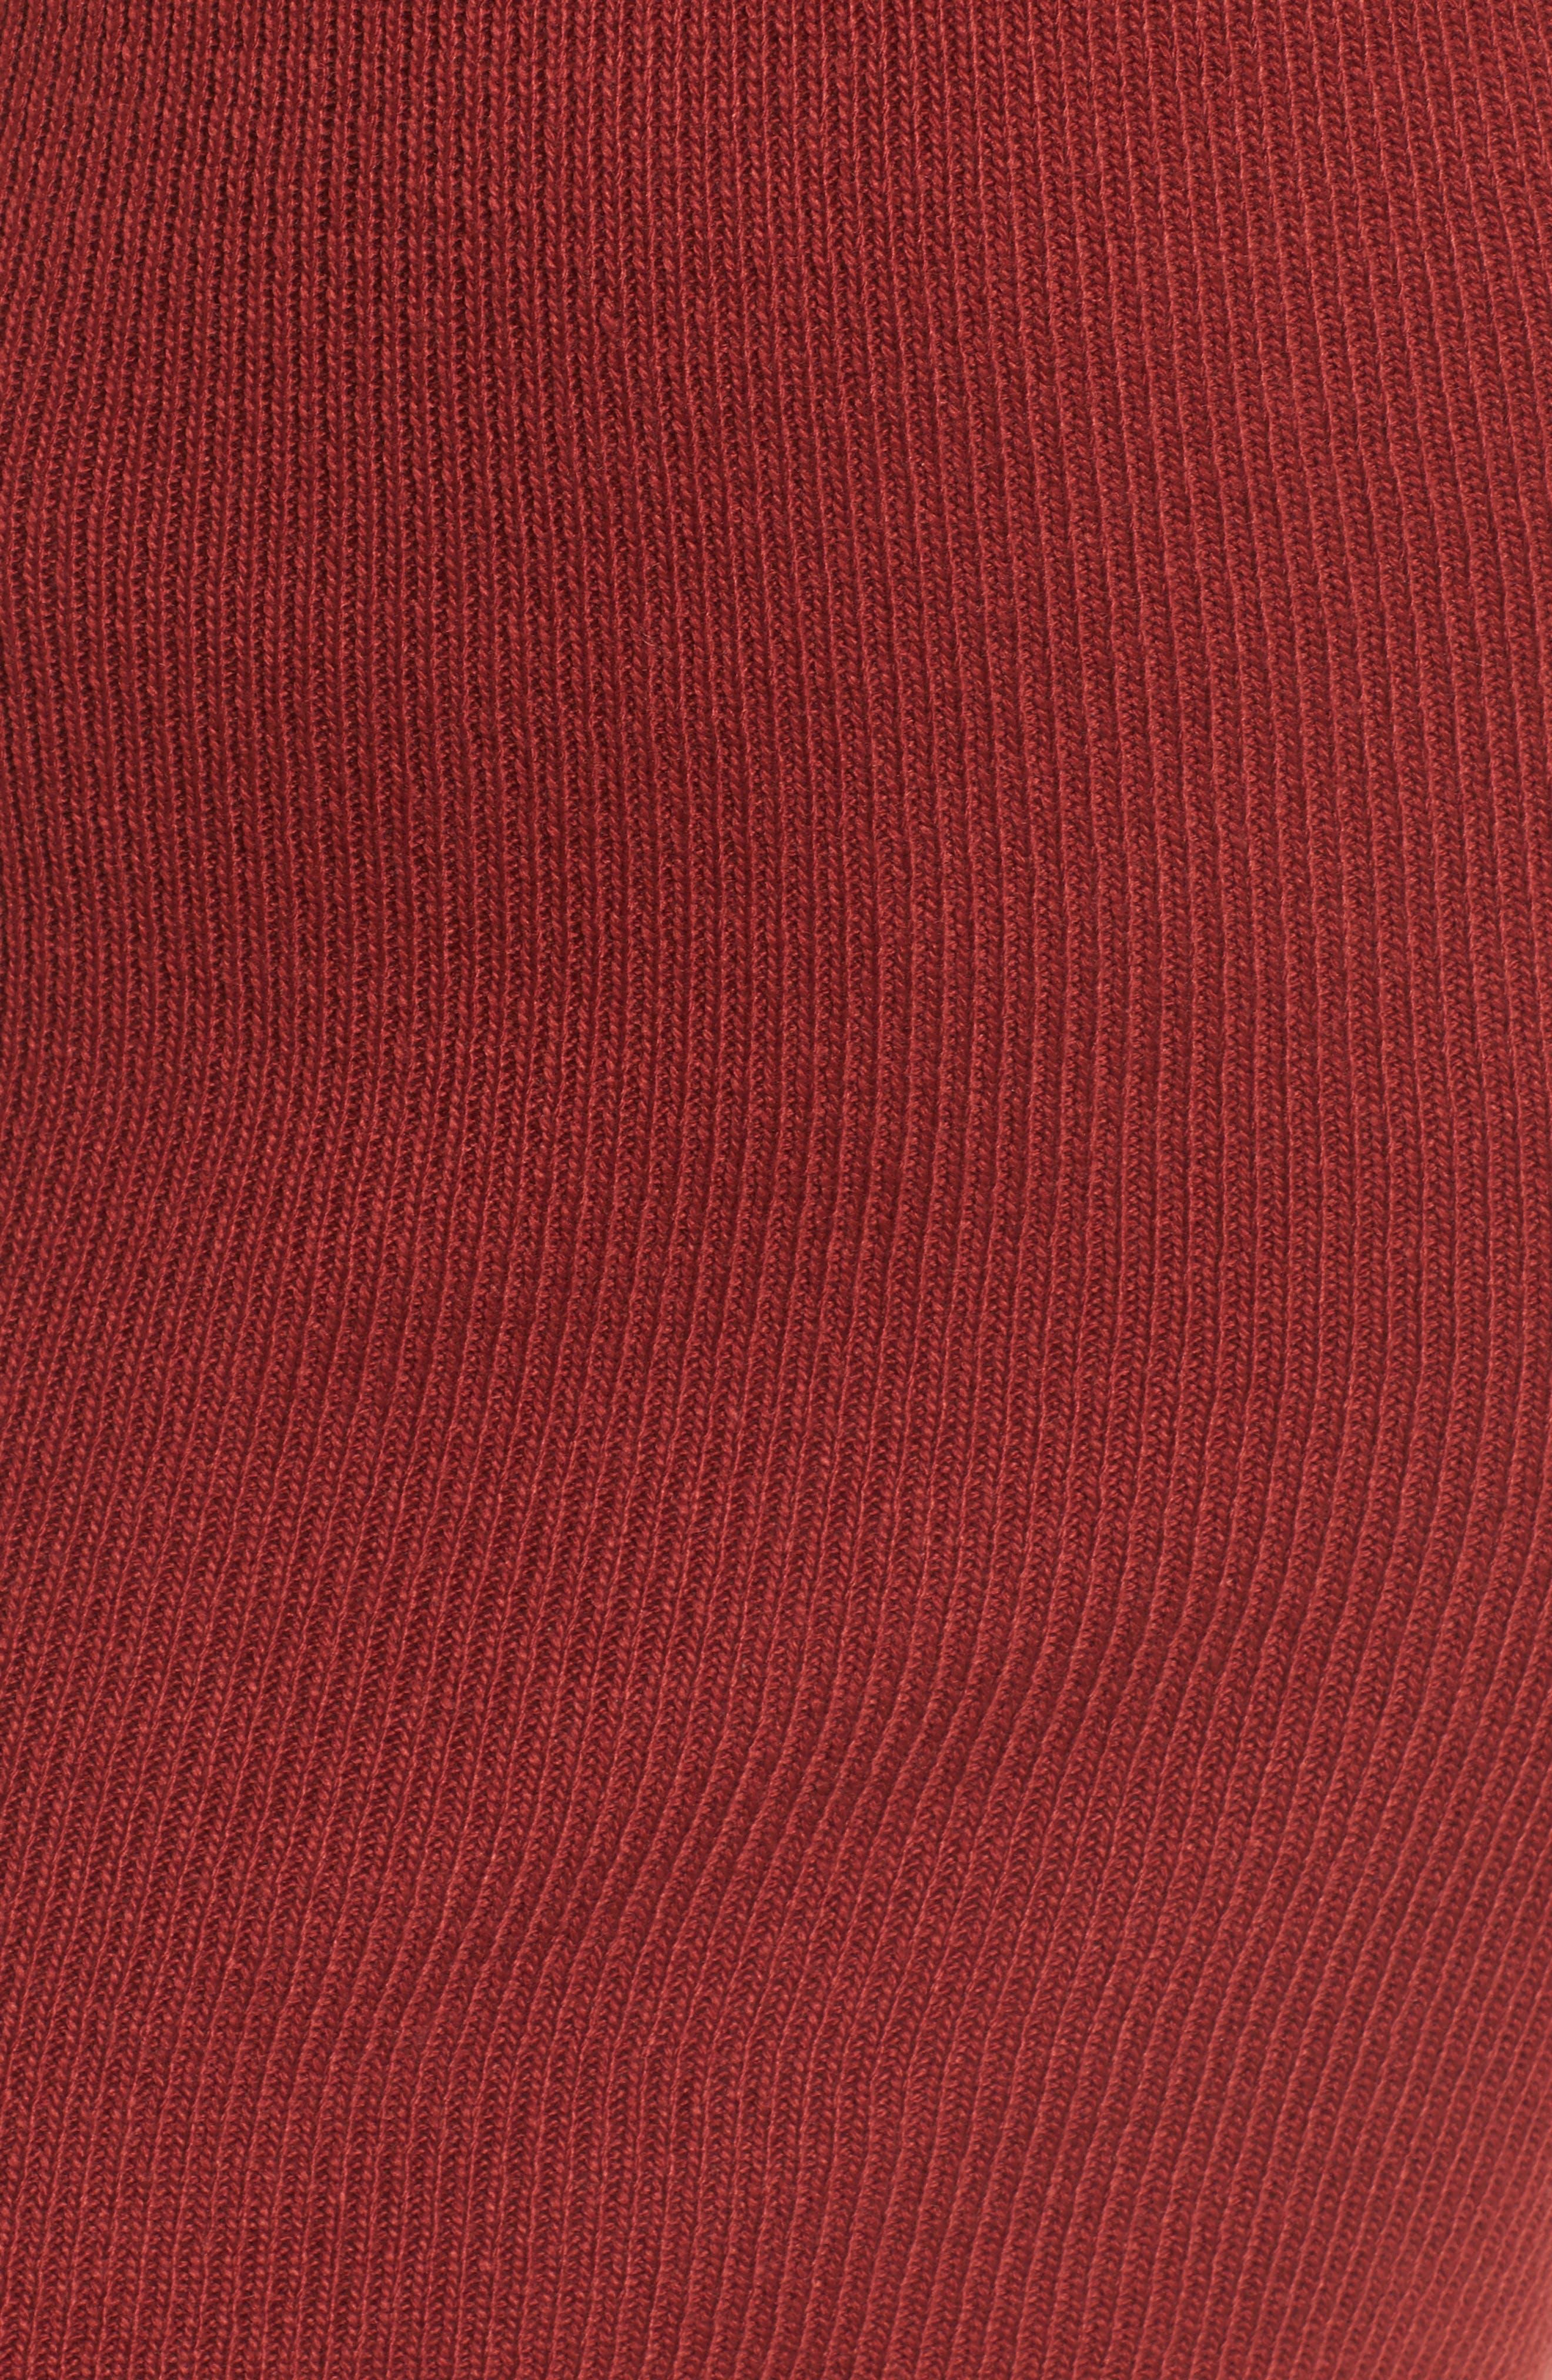 Thora Sheath Dress,                             Alternate thumbnail 5, color,                             605